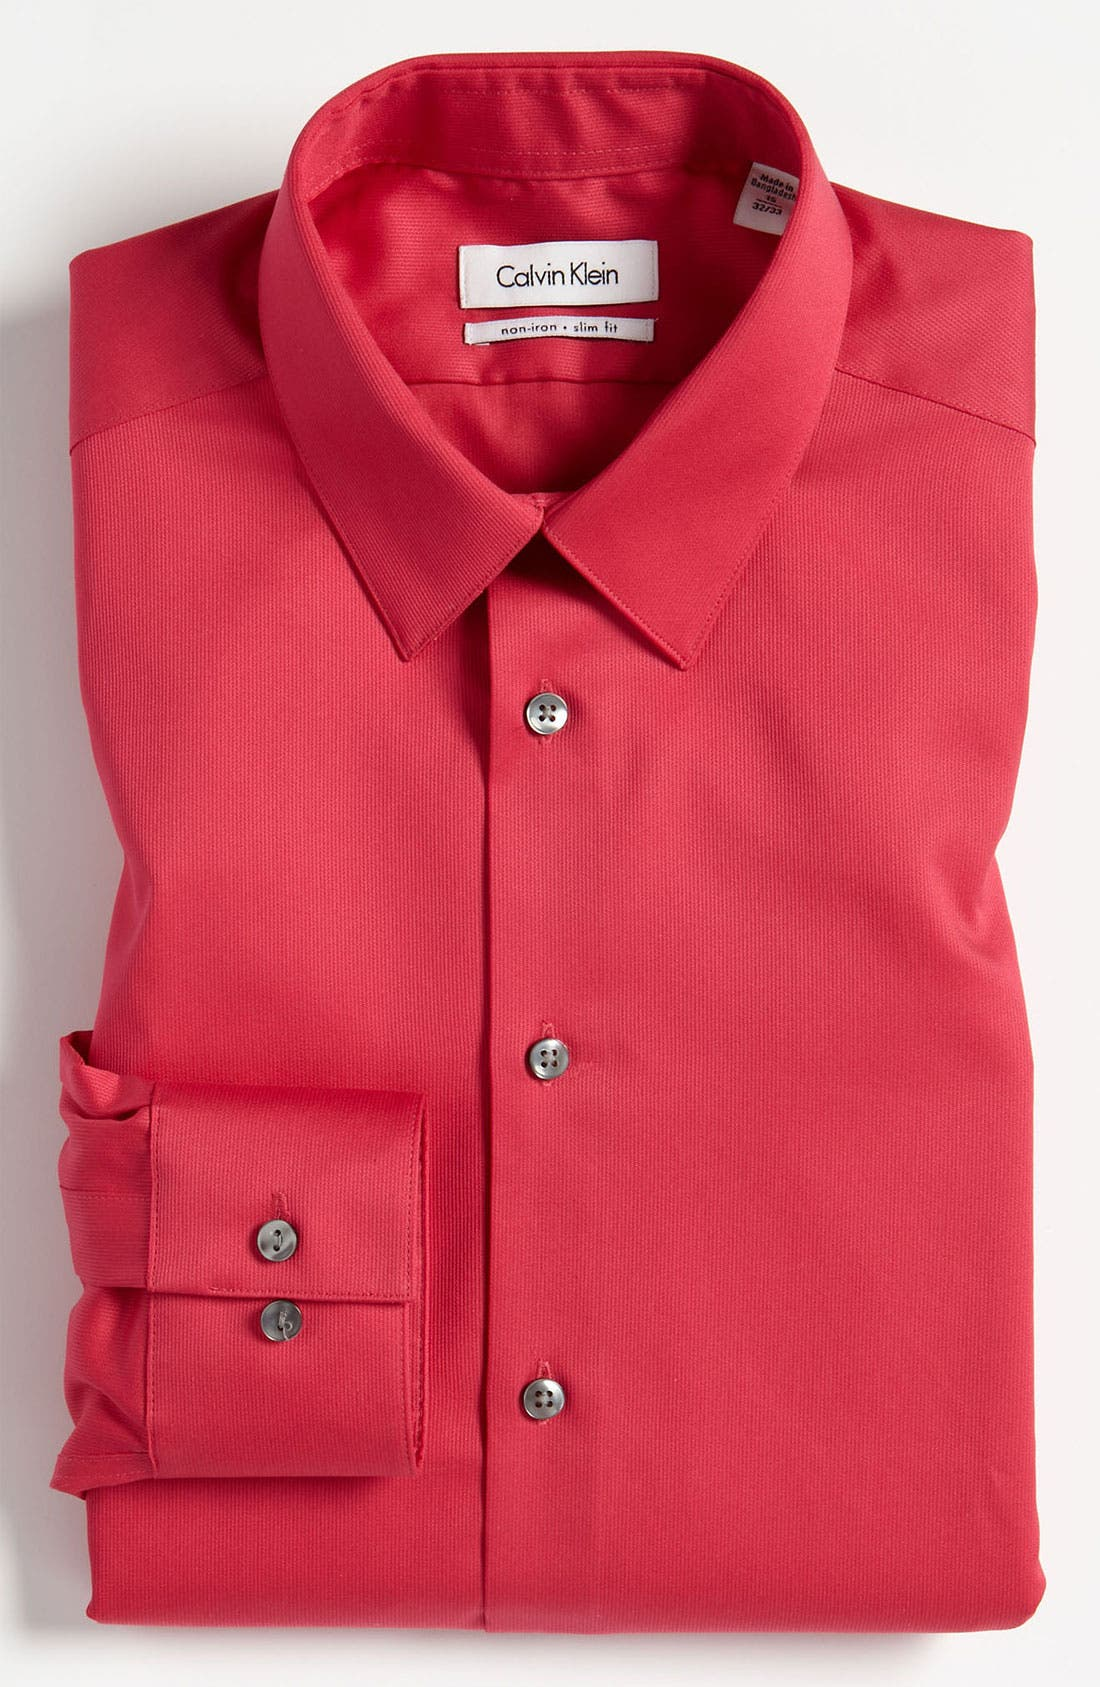 Main Image - Calvin Klein Slim Fit Non-Iron Dress Shirt (Online Only)